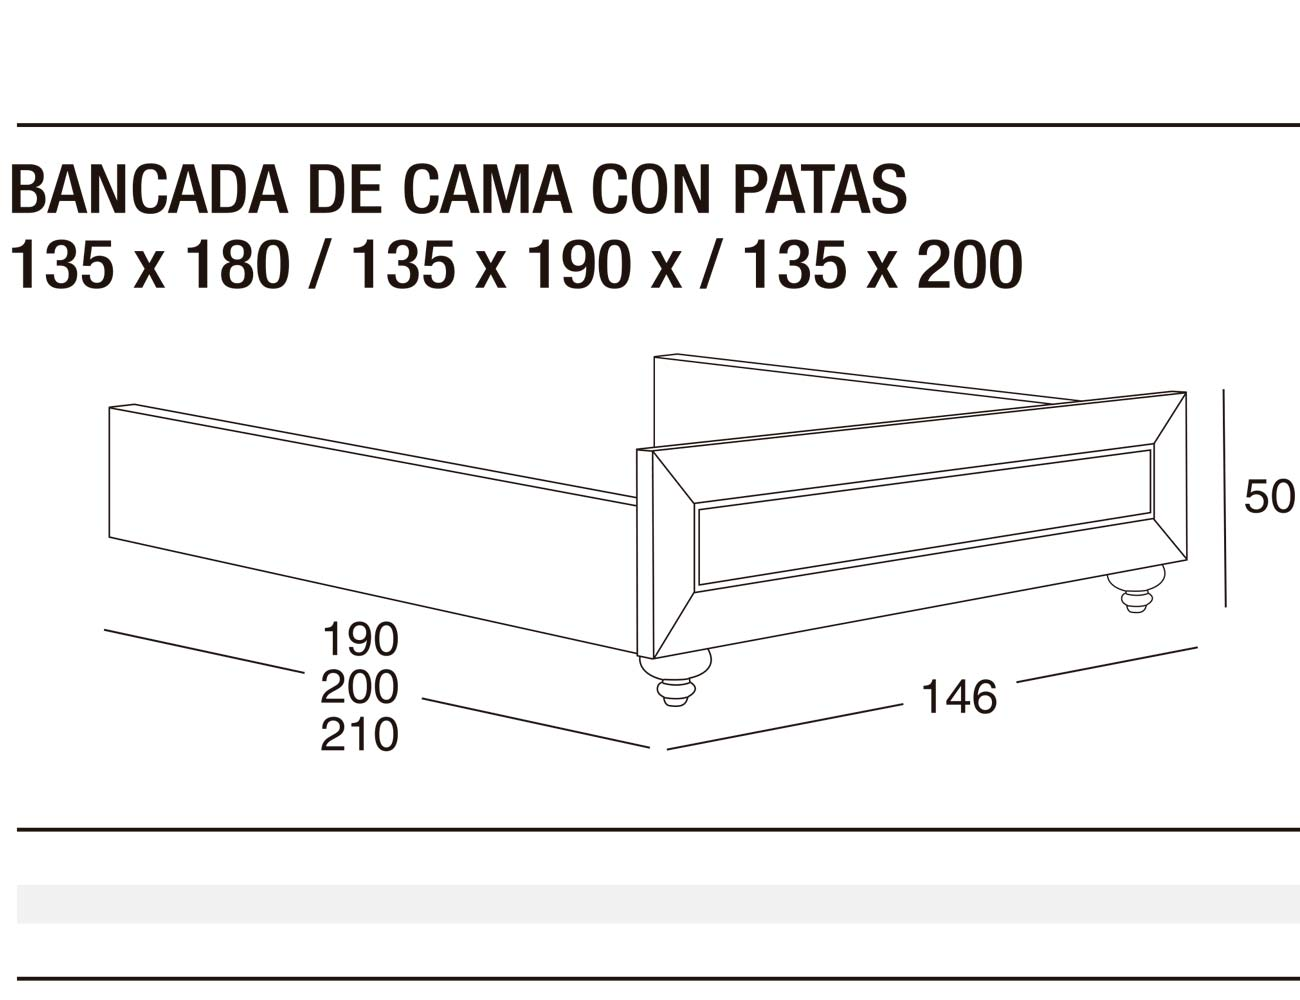 Bancada cama p 135x180 135x190 135x2001